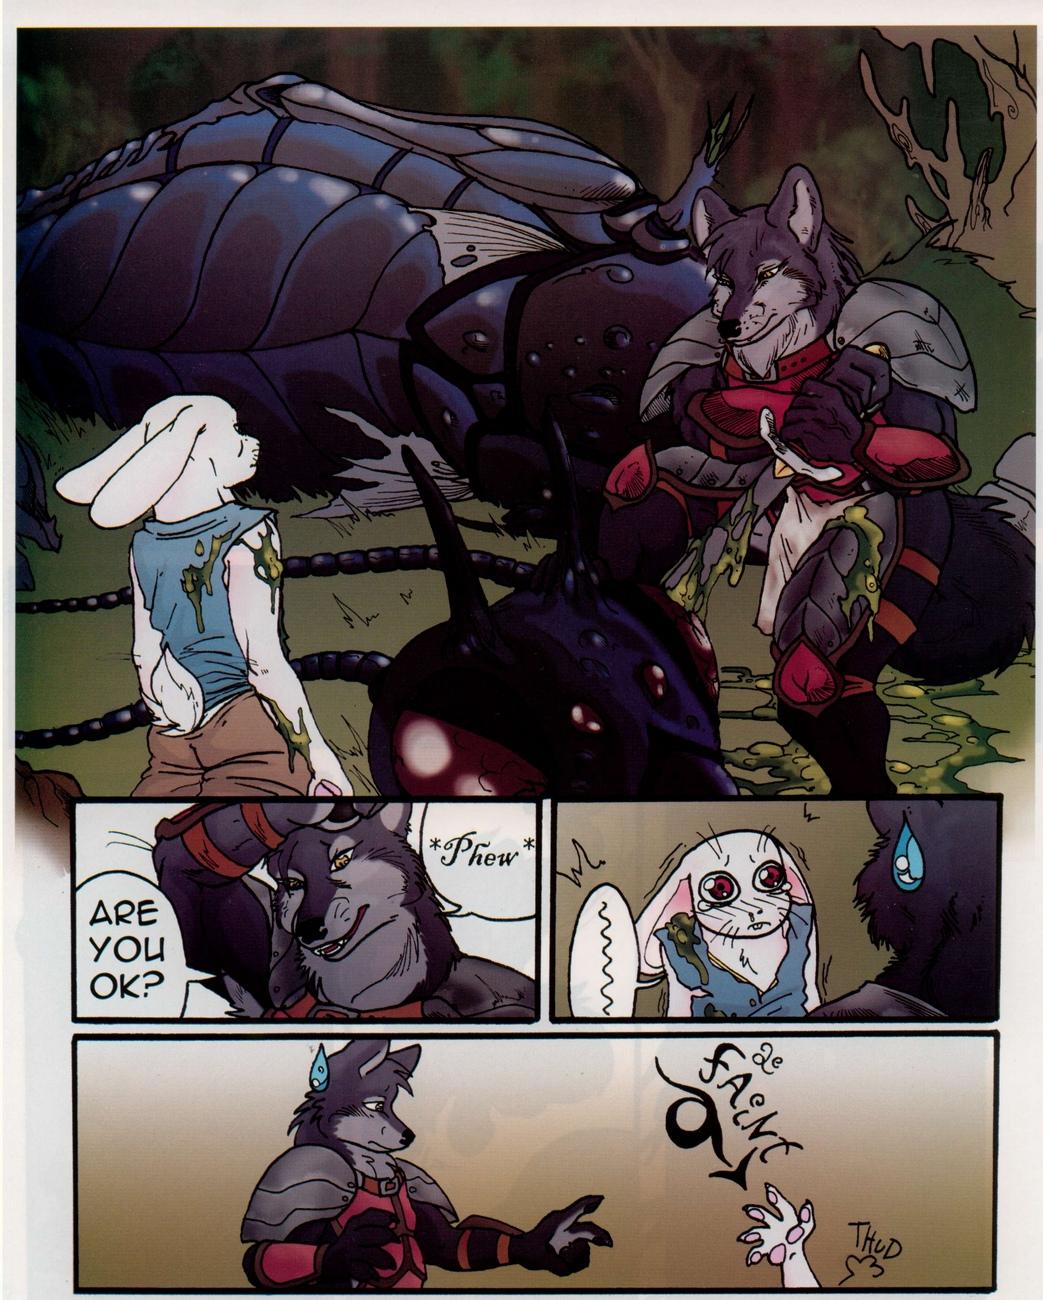 Royal-Tail-Chance-Beginnings 10 free sex comic